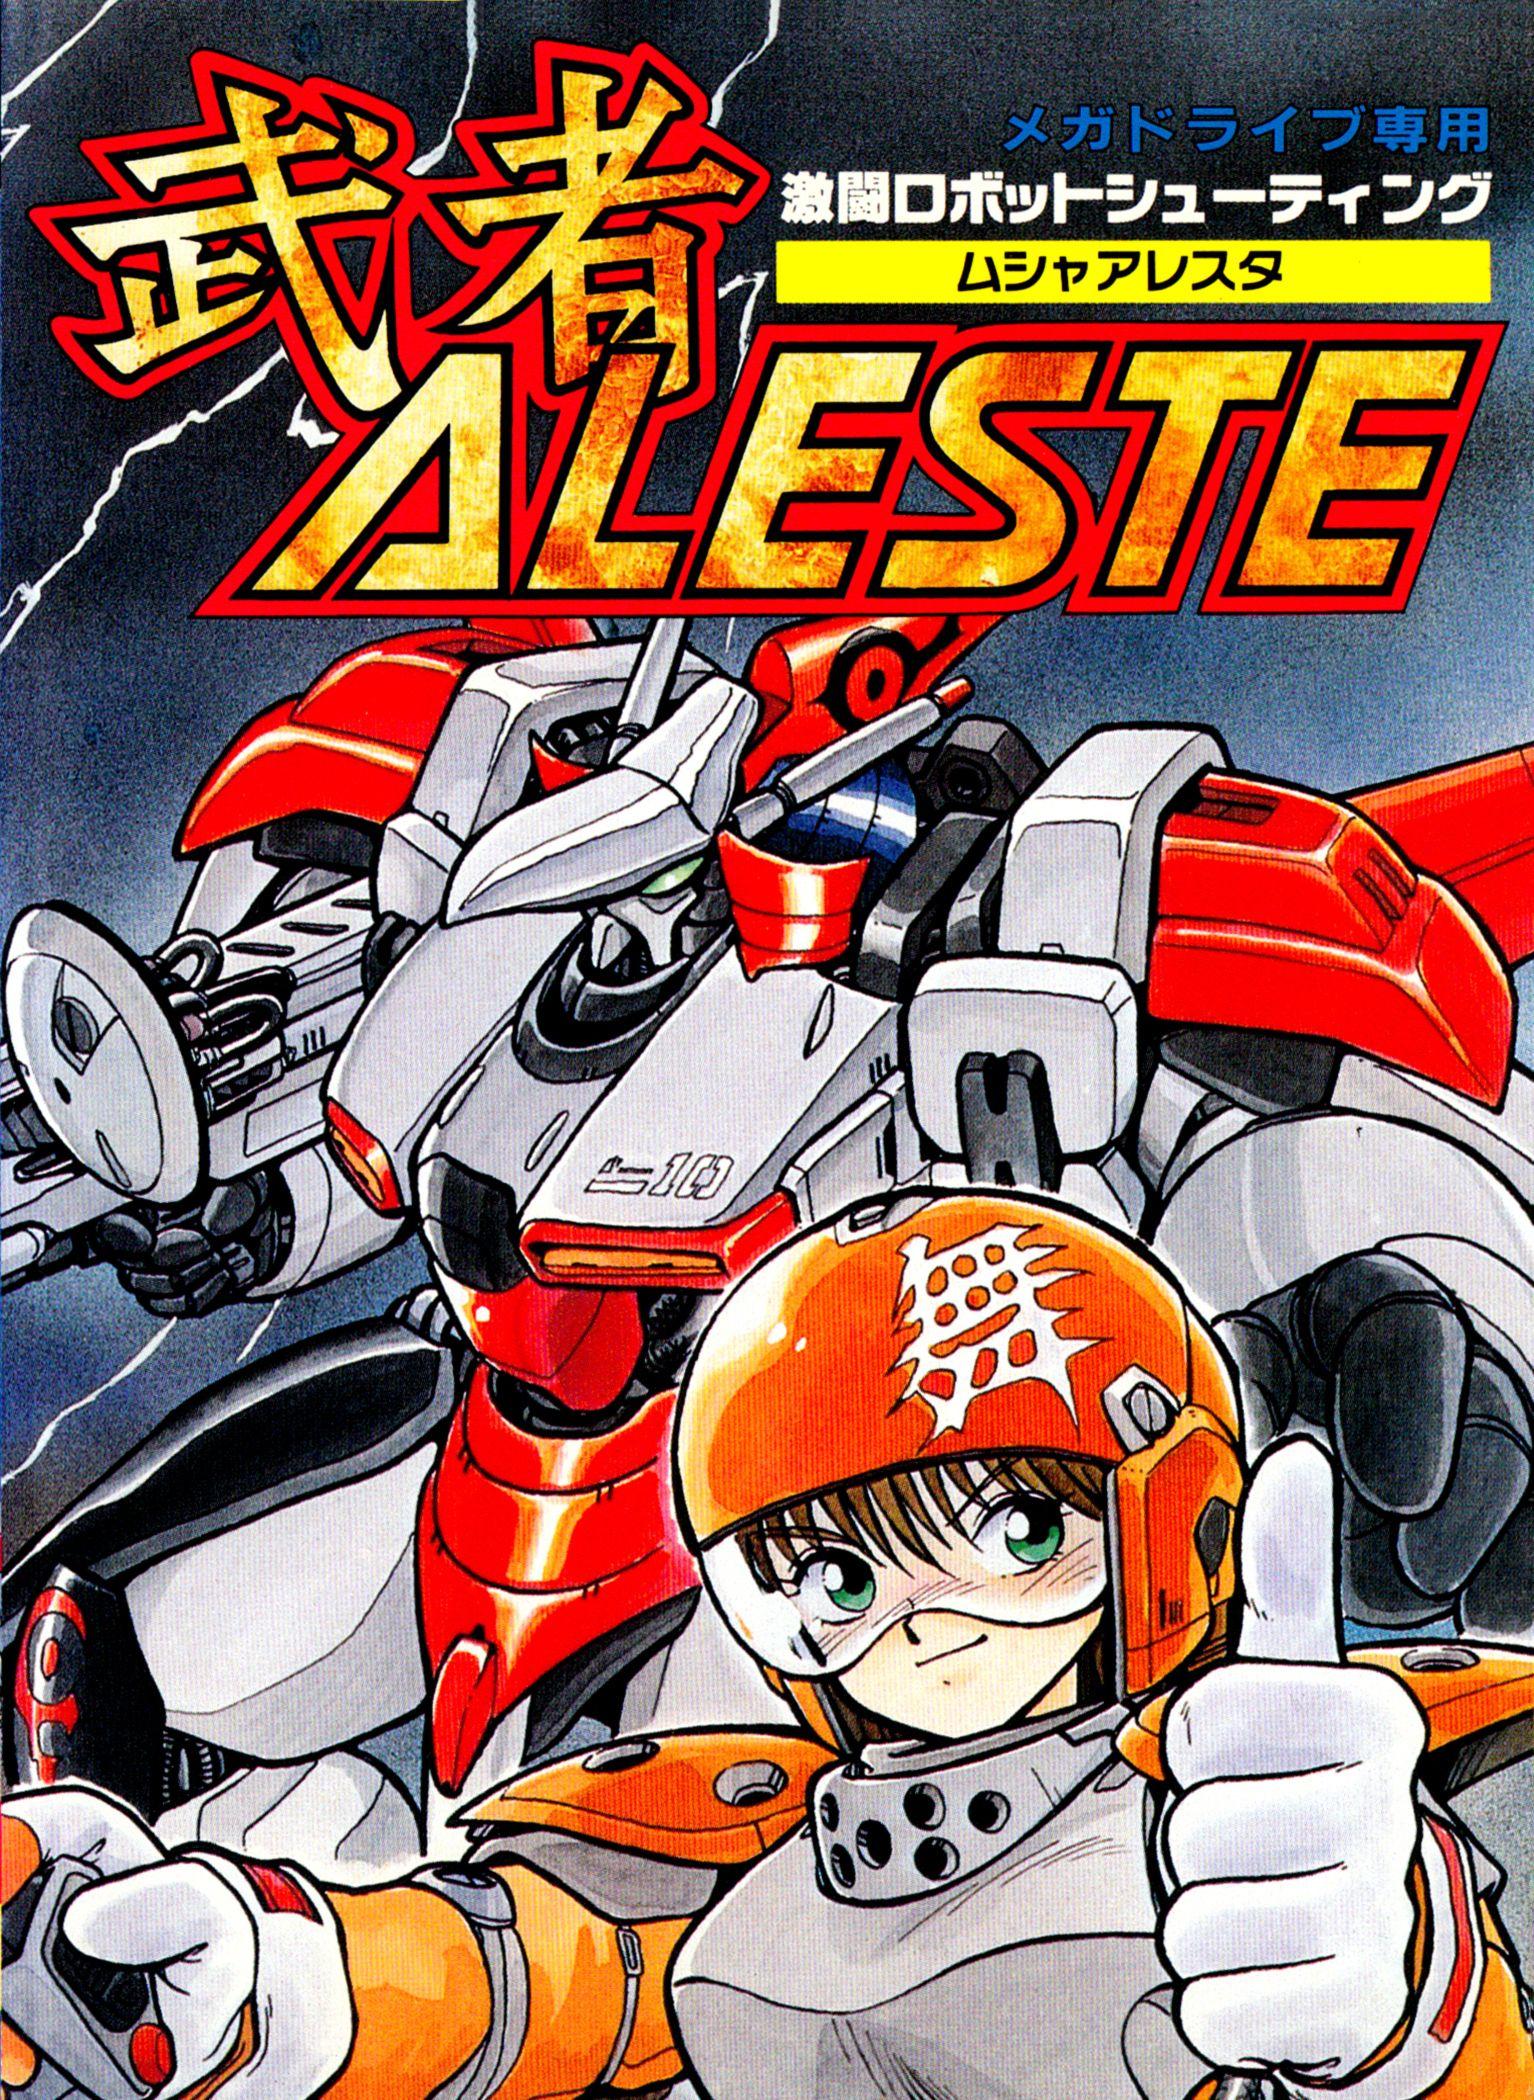 M U S H A Aleste Mega Drive 1990 Retro Gaming Art Video Game Posters Retro Gaming